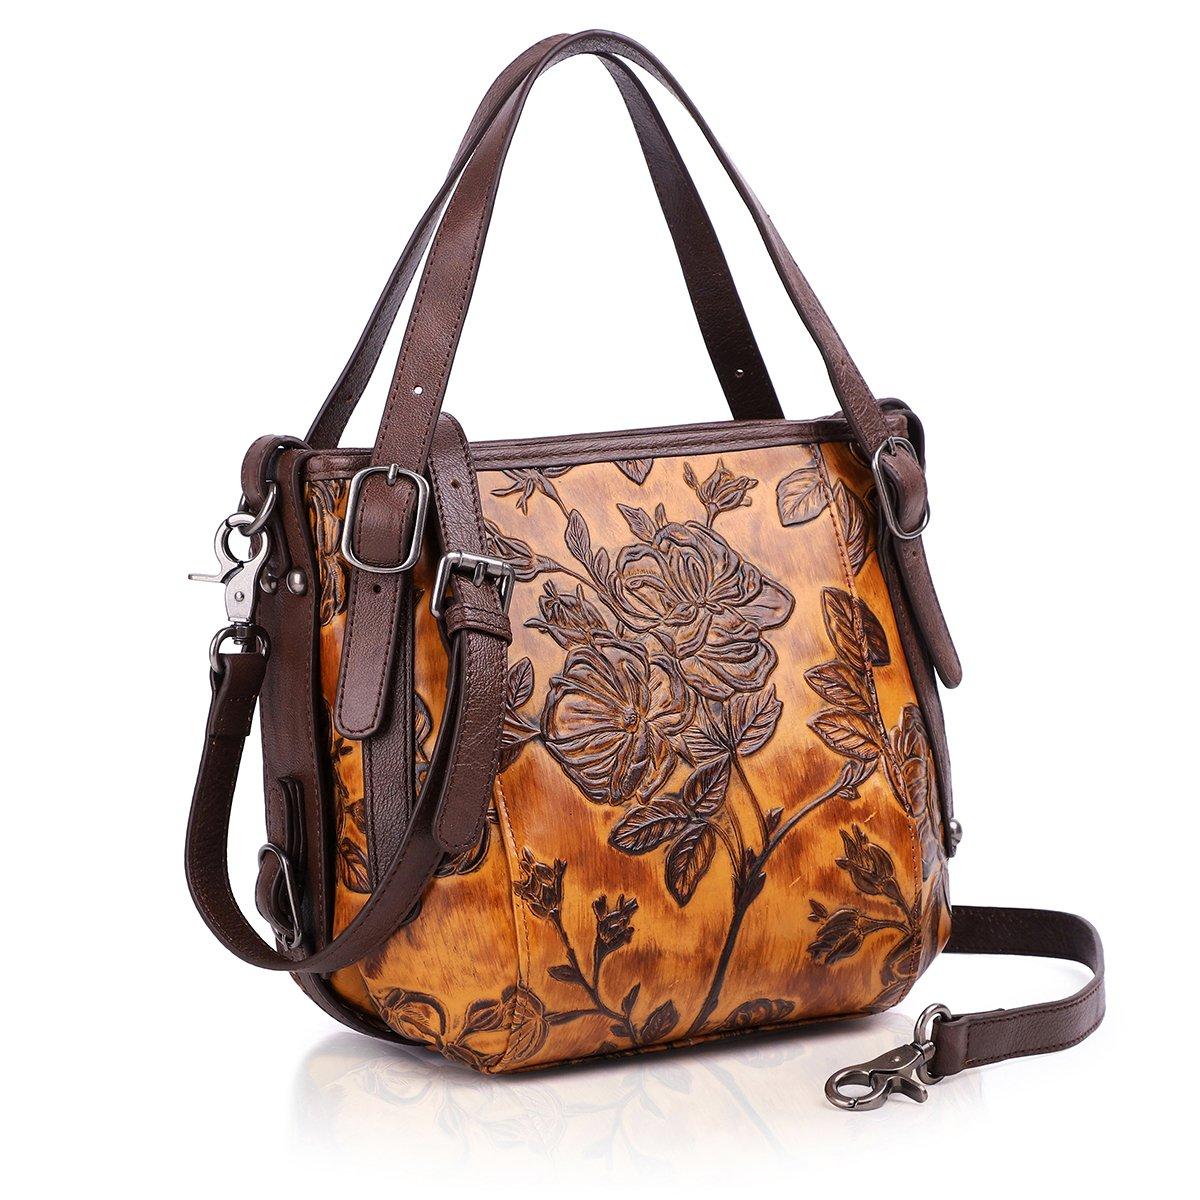 APHISON Designer Unique Embossed Floral Cowhide Leather Tote Style Ladies  Shoulder Bags Handbags 83588 Yellow  Amazon.ca  Shoes   Handbags